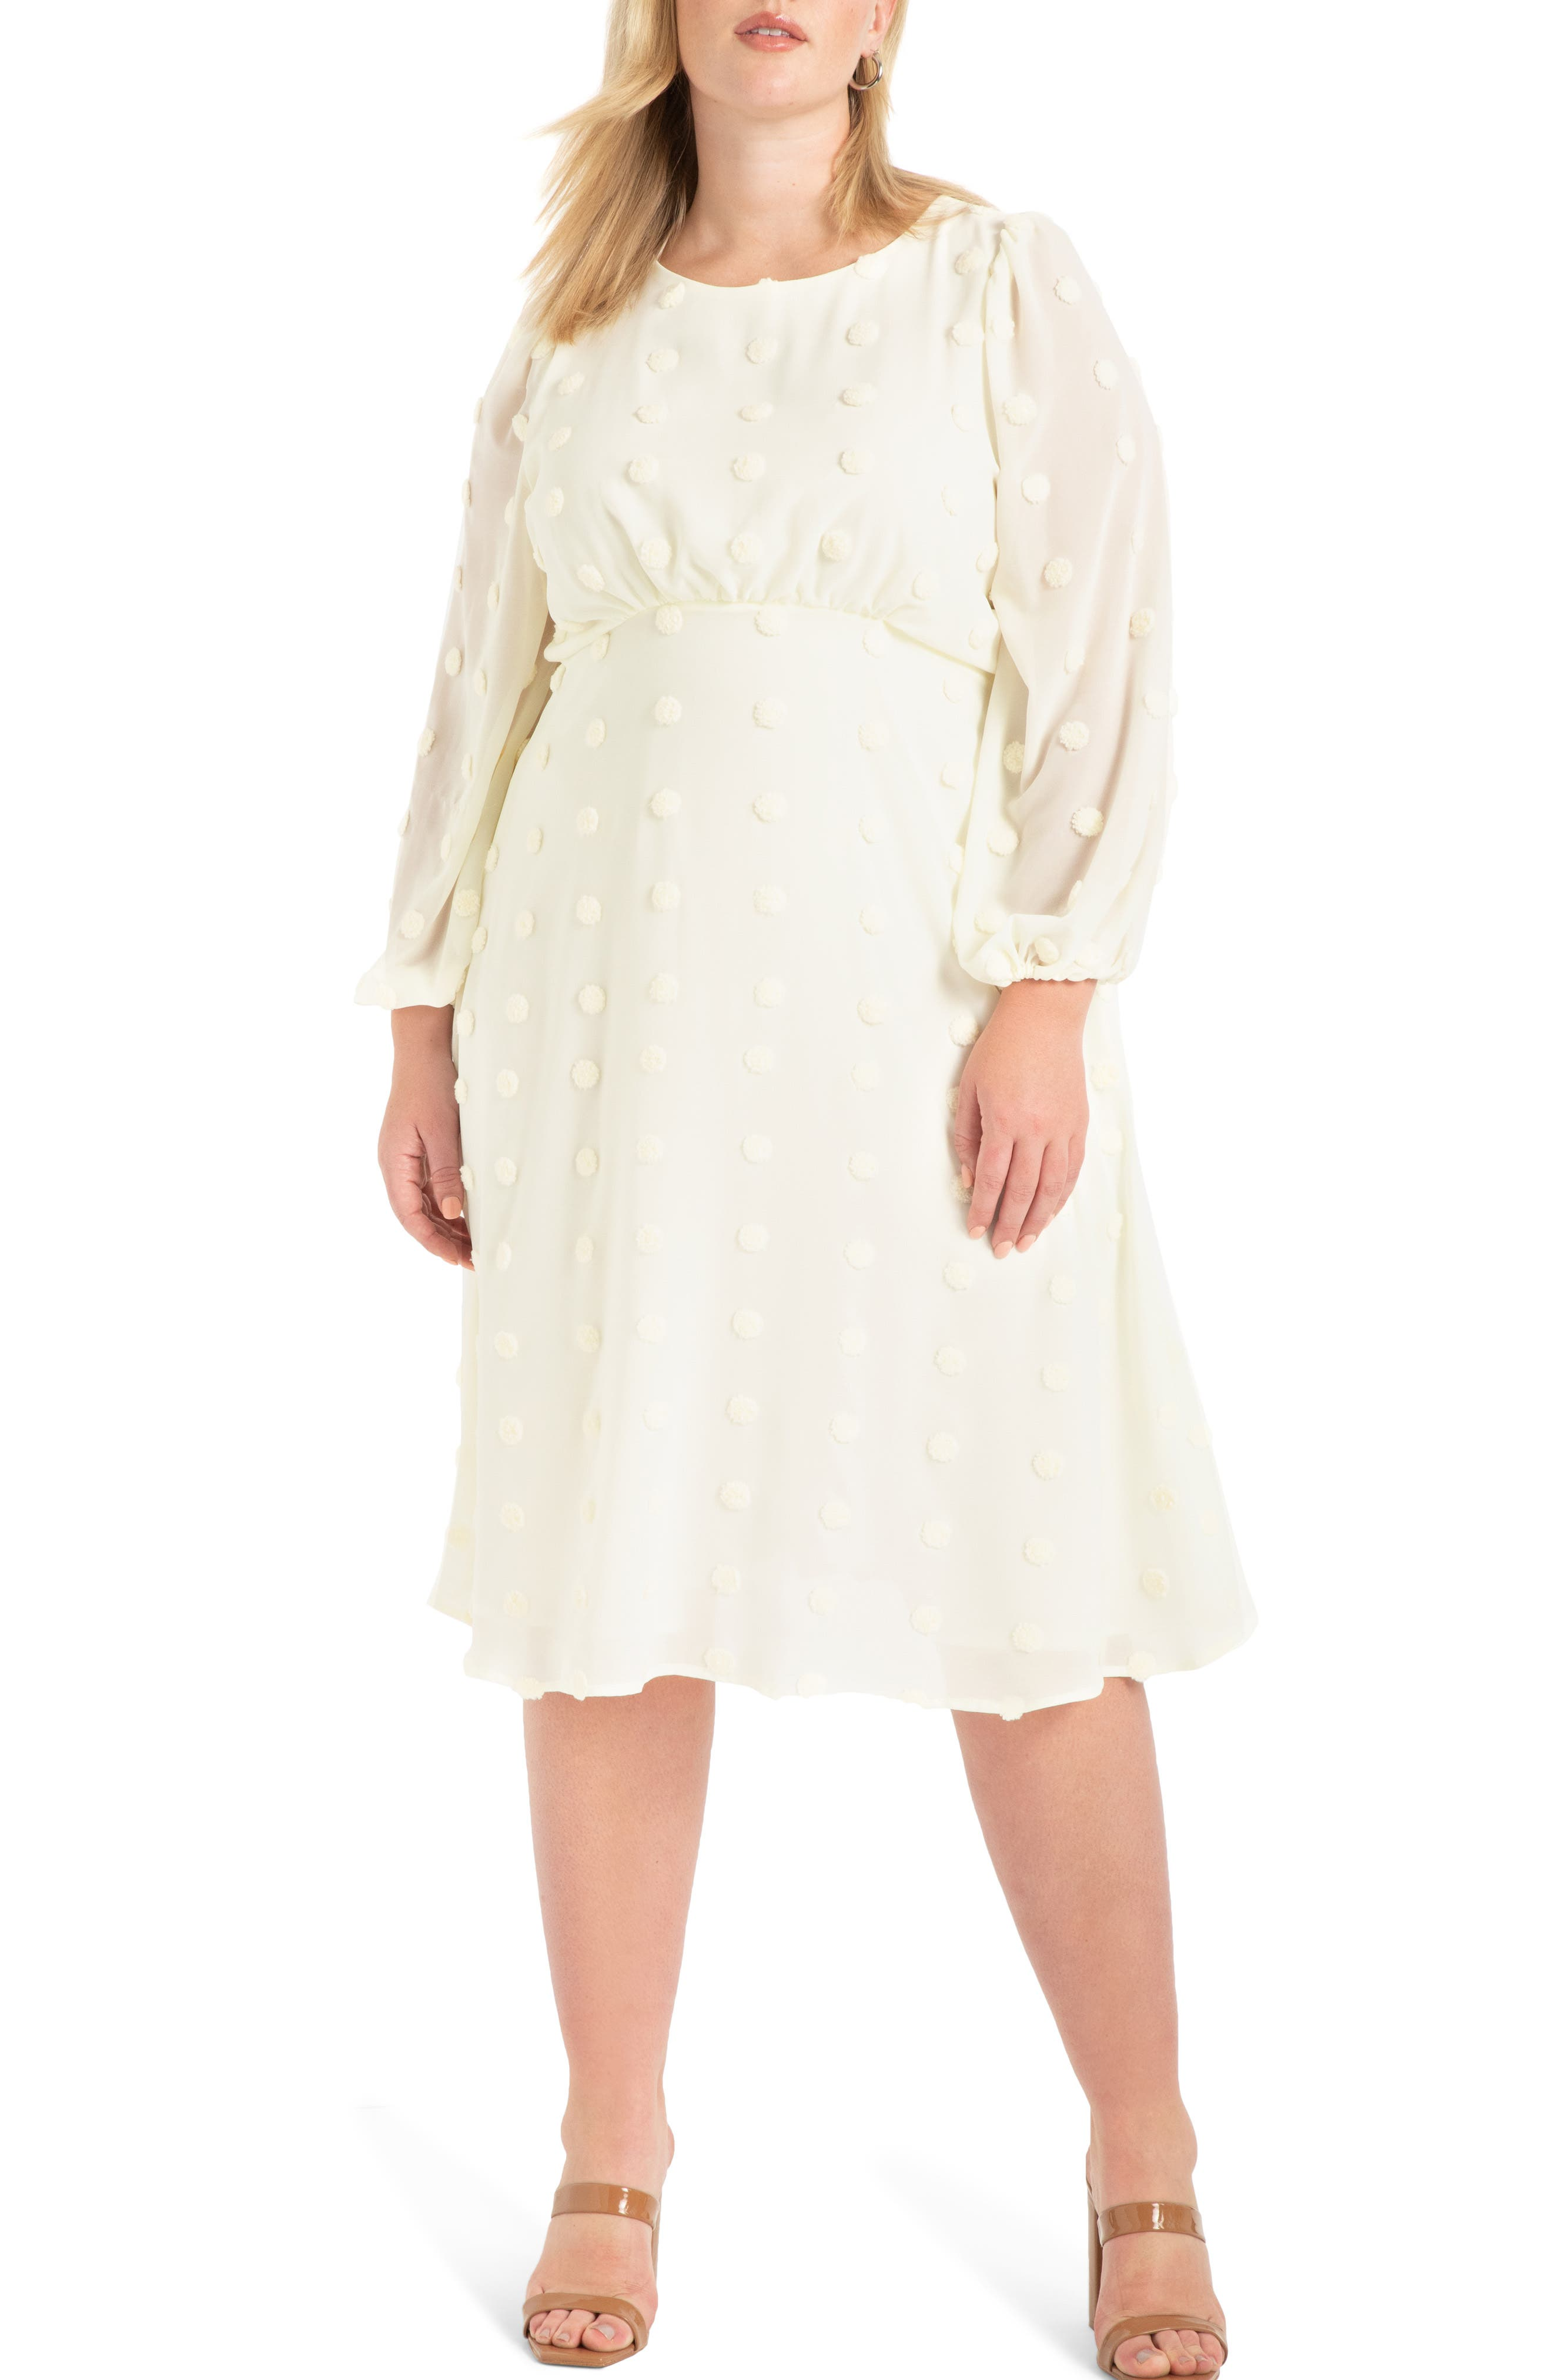 60s Wedding Dresses   70s Wedding Dresses Plus Size Womens Eloquii Dot Chiffon Long Sleeve Midi Dress Size 28W - White $129.95 AT vintagedancer.com